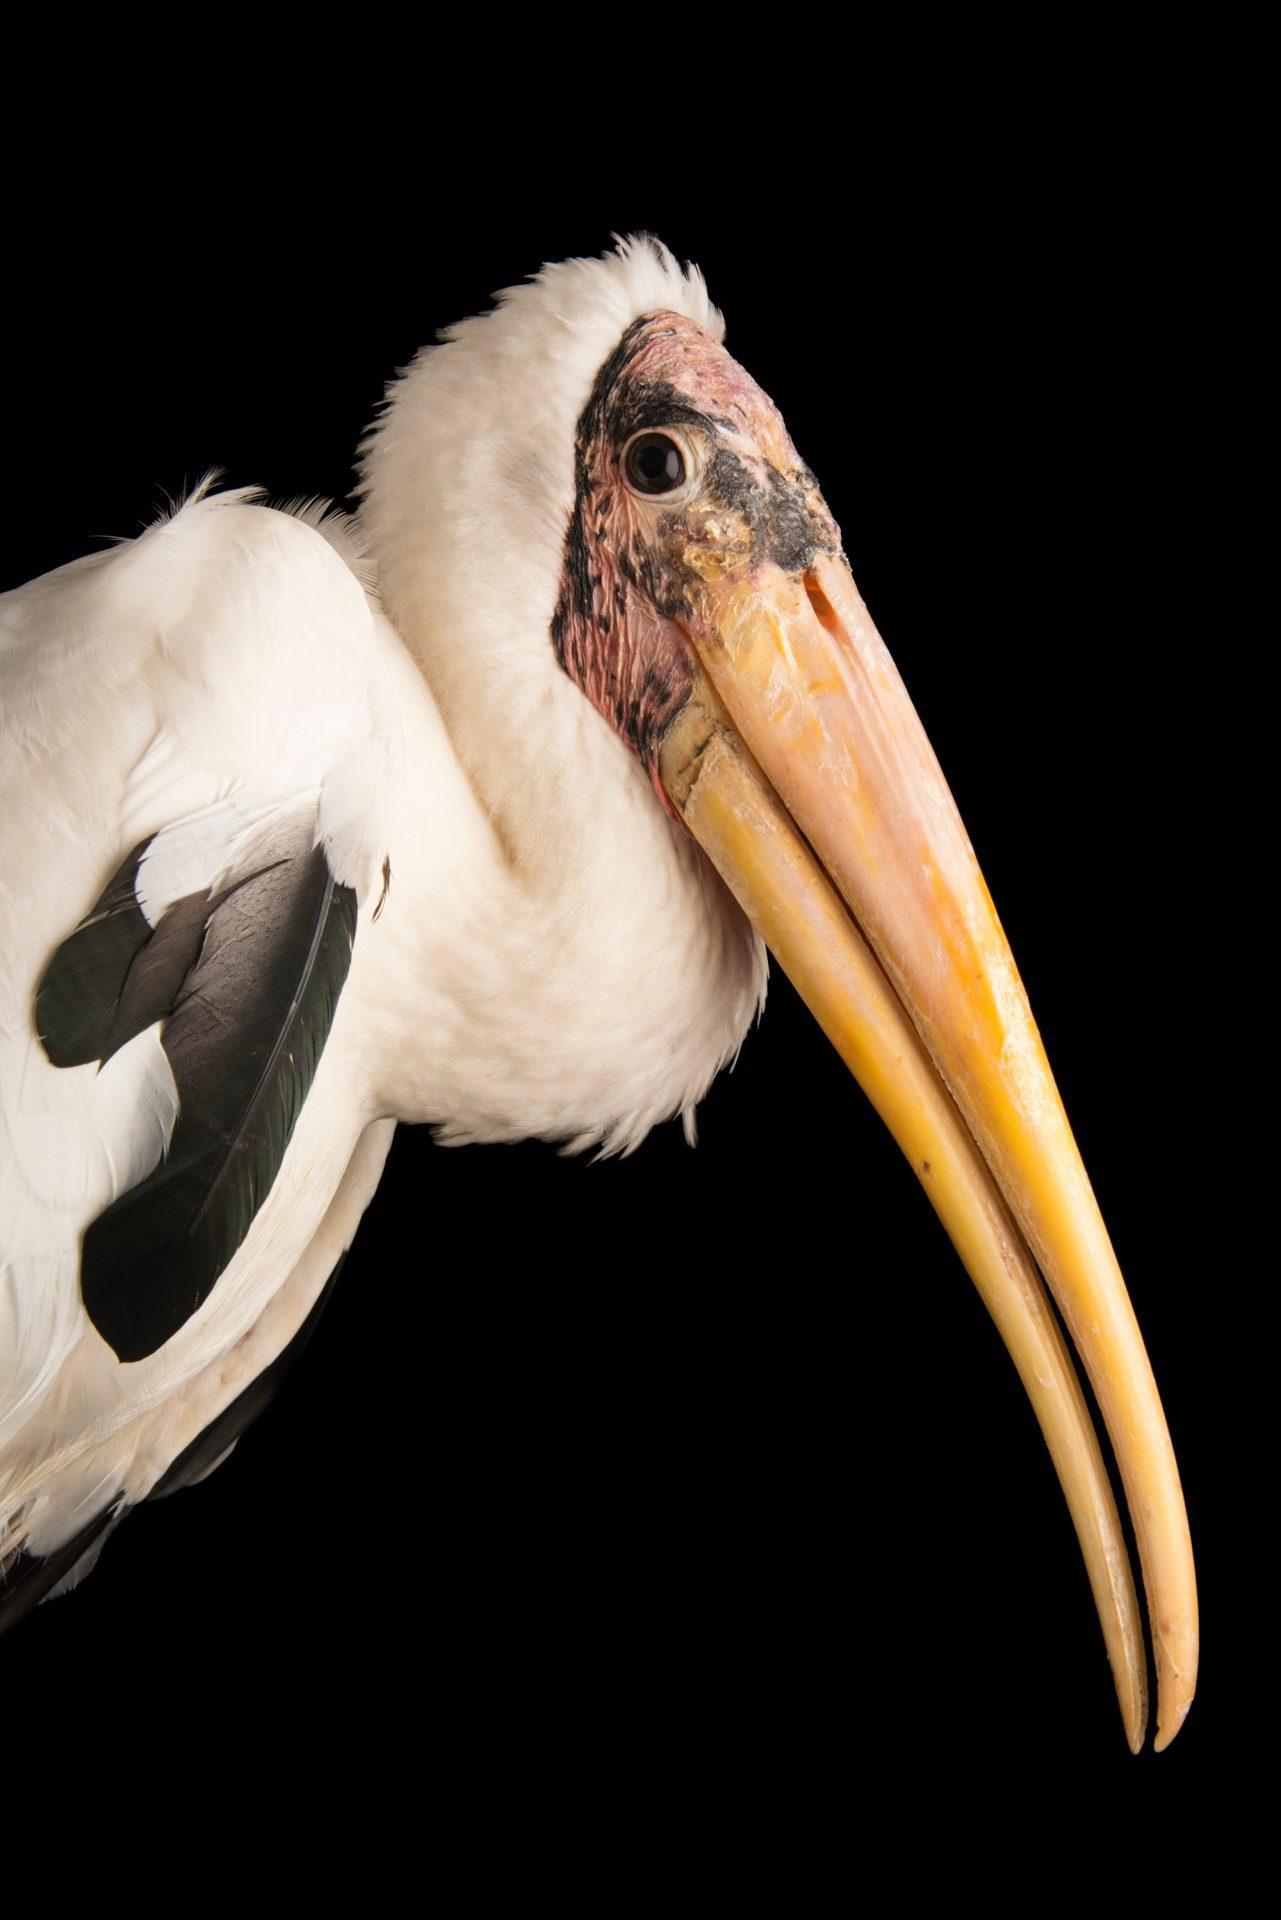 Photo: An endangered milky stork (Mycteria cinerea) at Penang Bird Park.